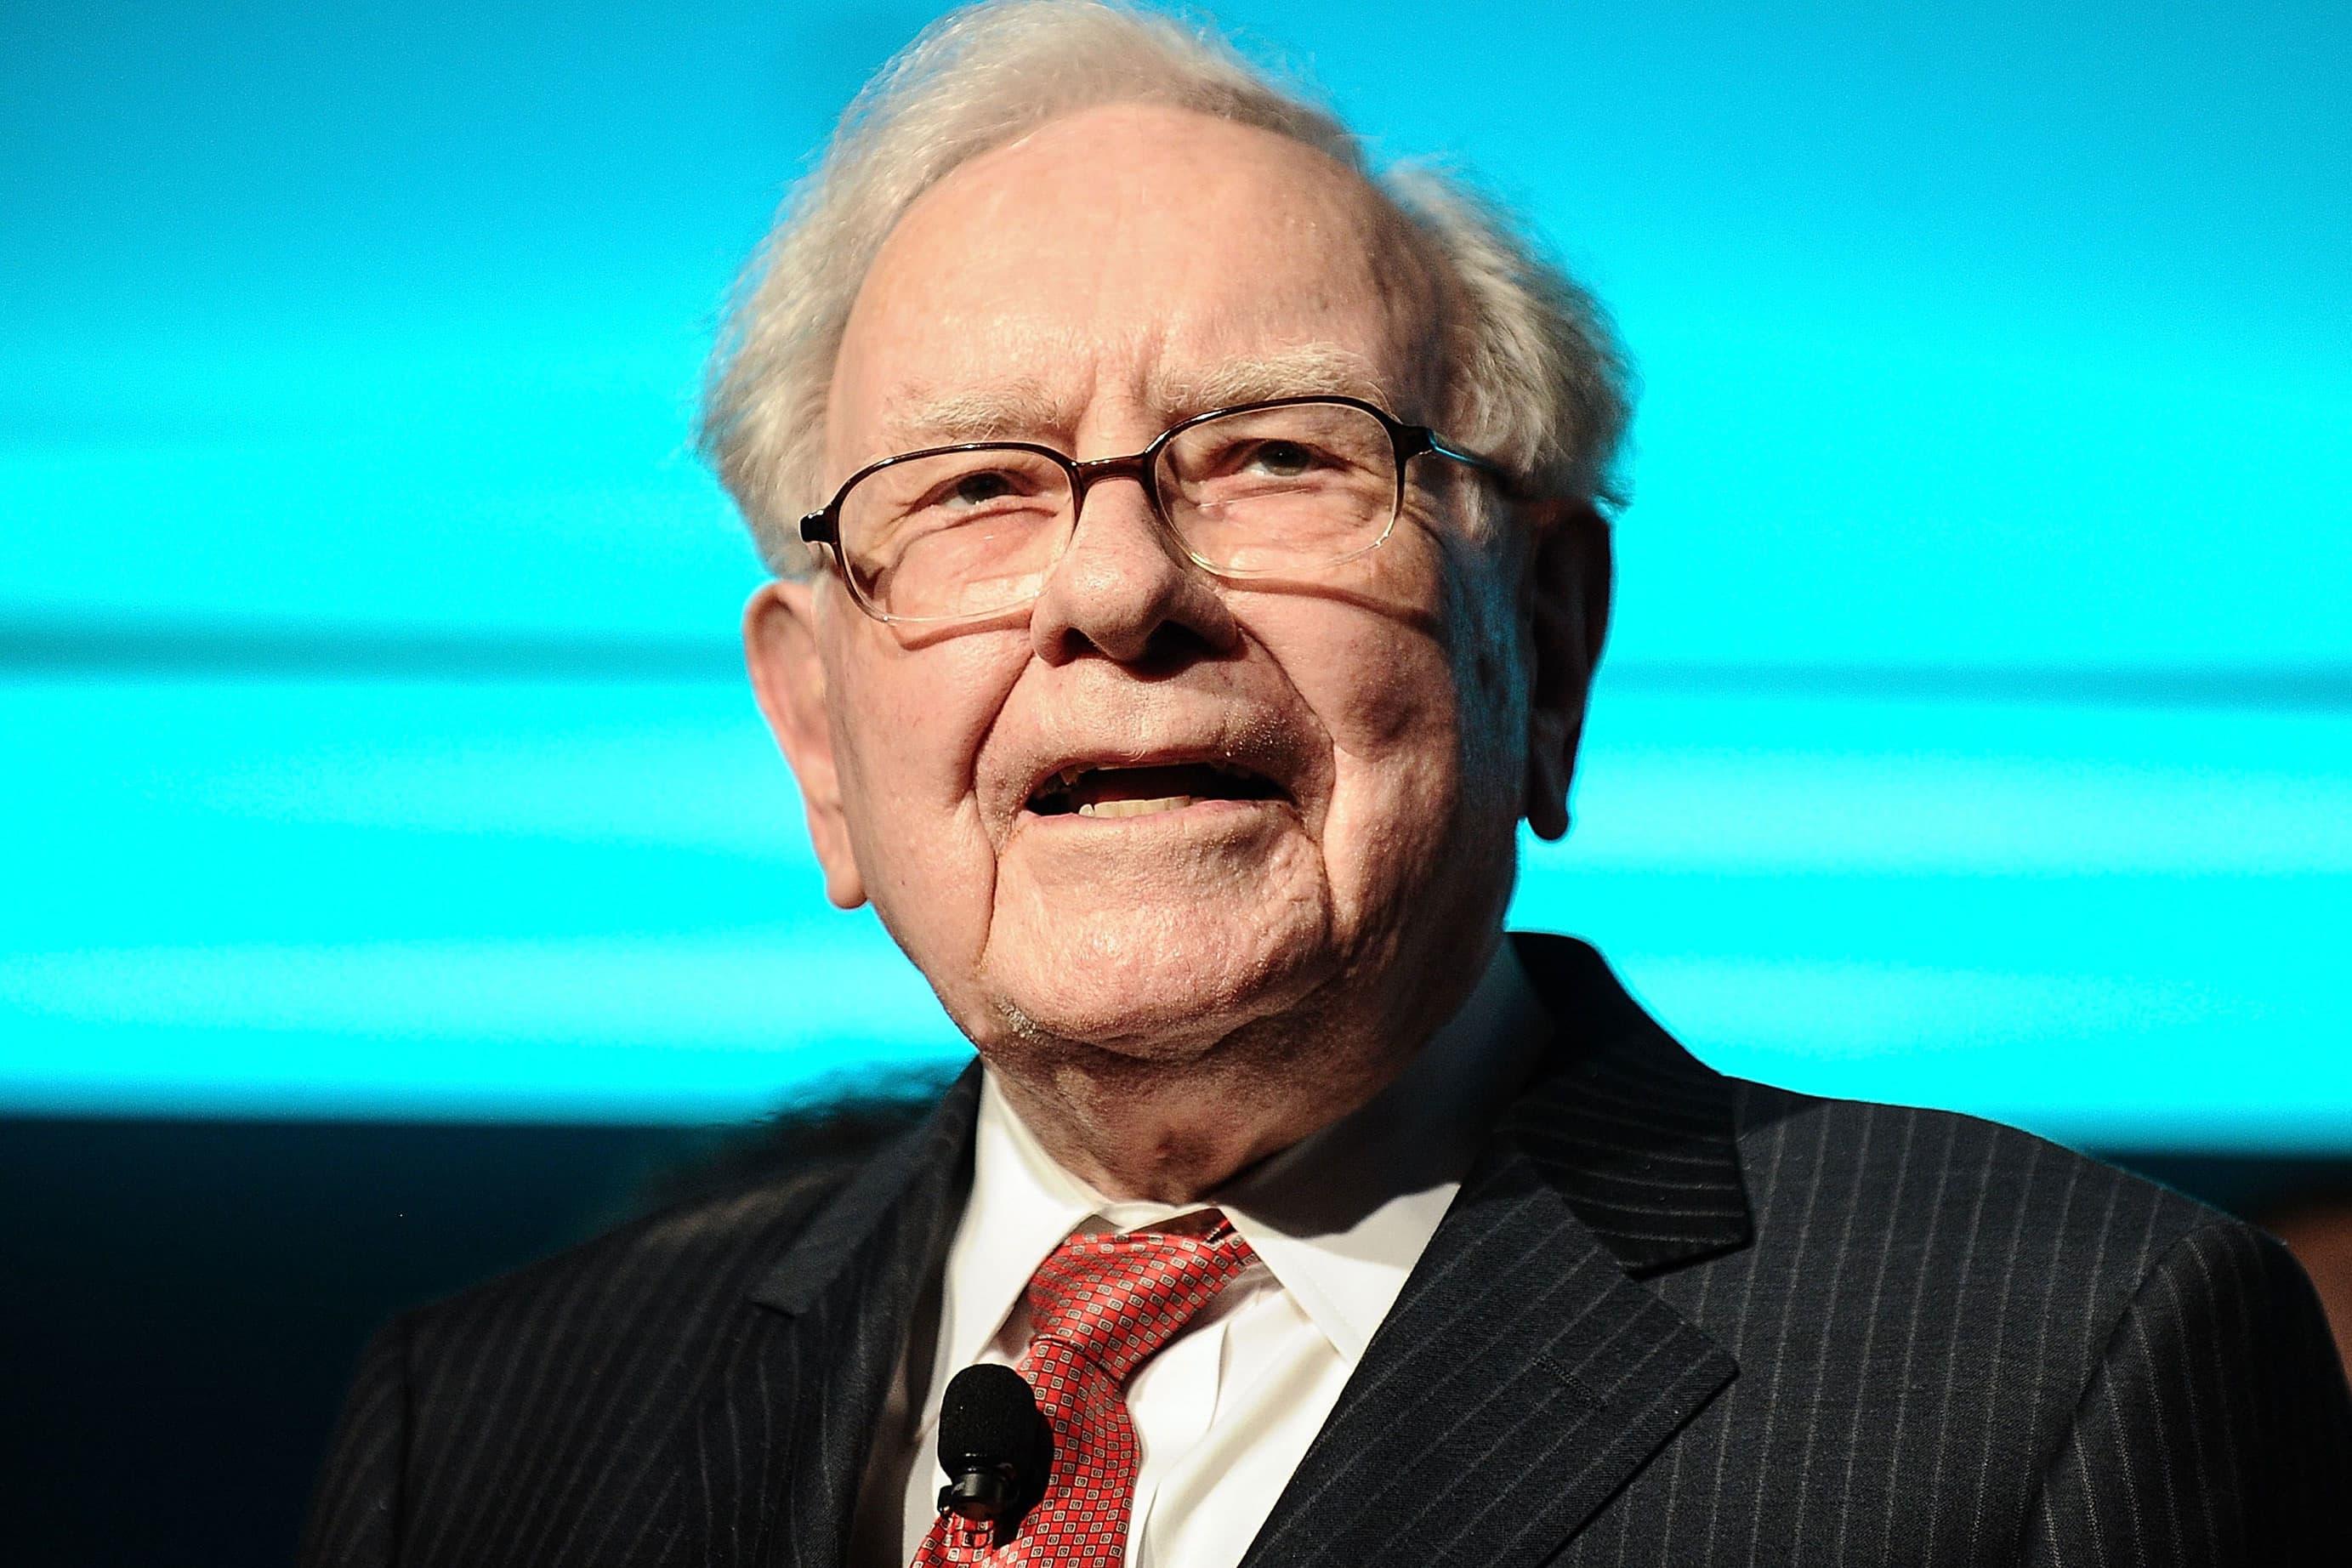 Warren Buffett's Berkshire Hathaway reports better-than-expected profit and a $128 billion cash pile